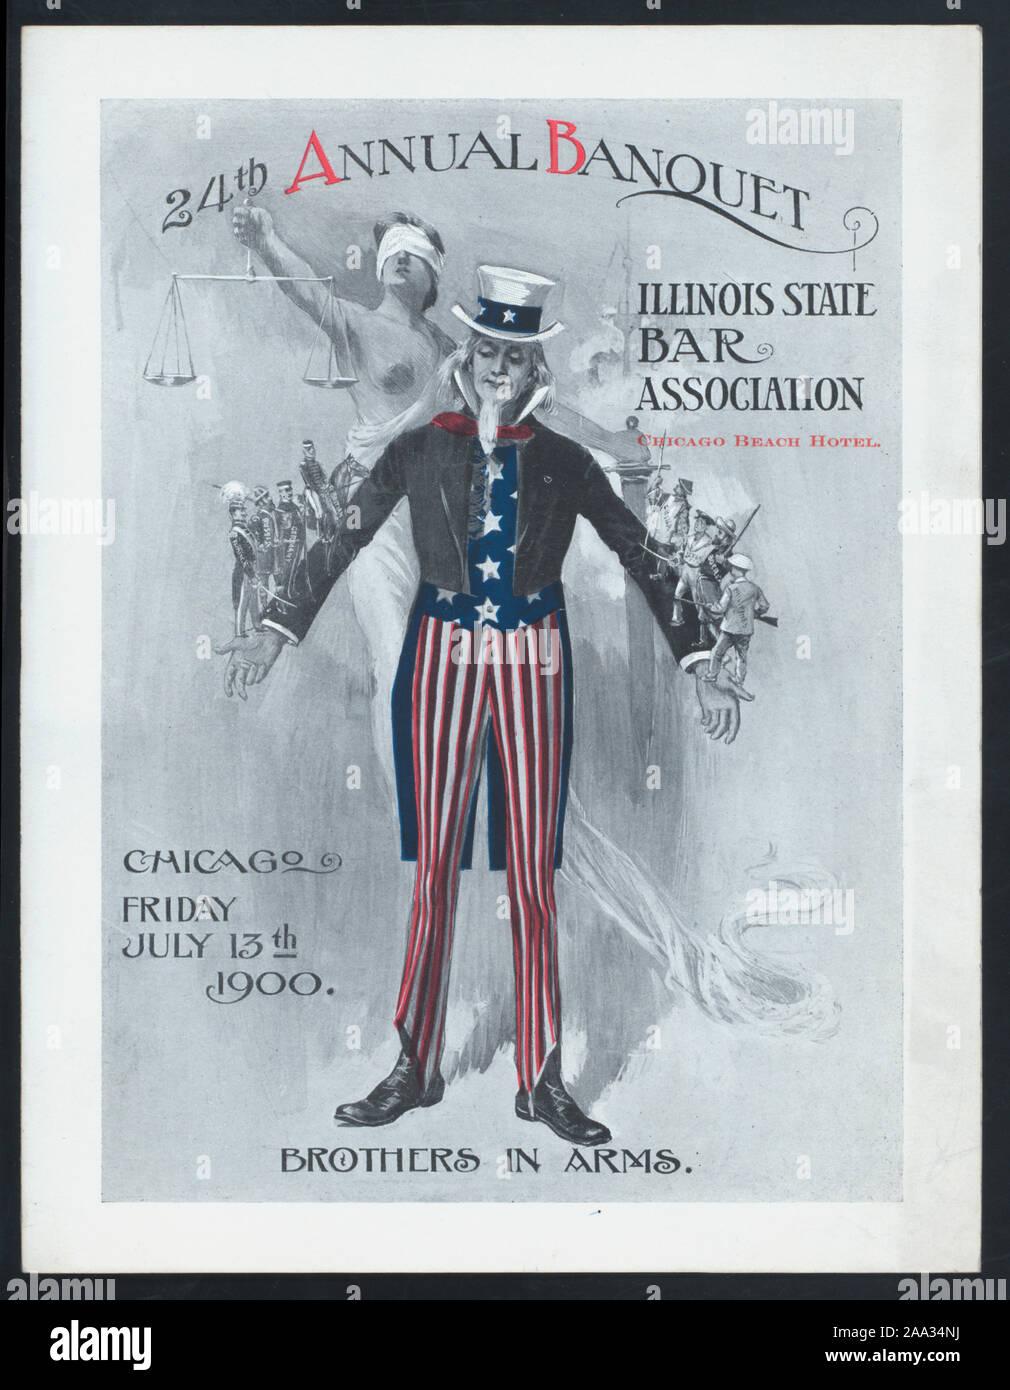 Illinois State Prison Black /& White Striped Uniform Shirt and Pants